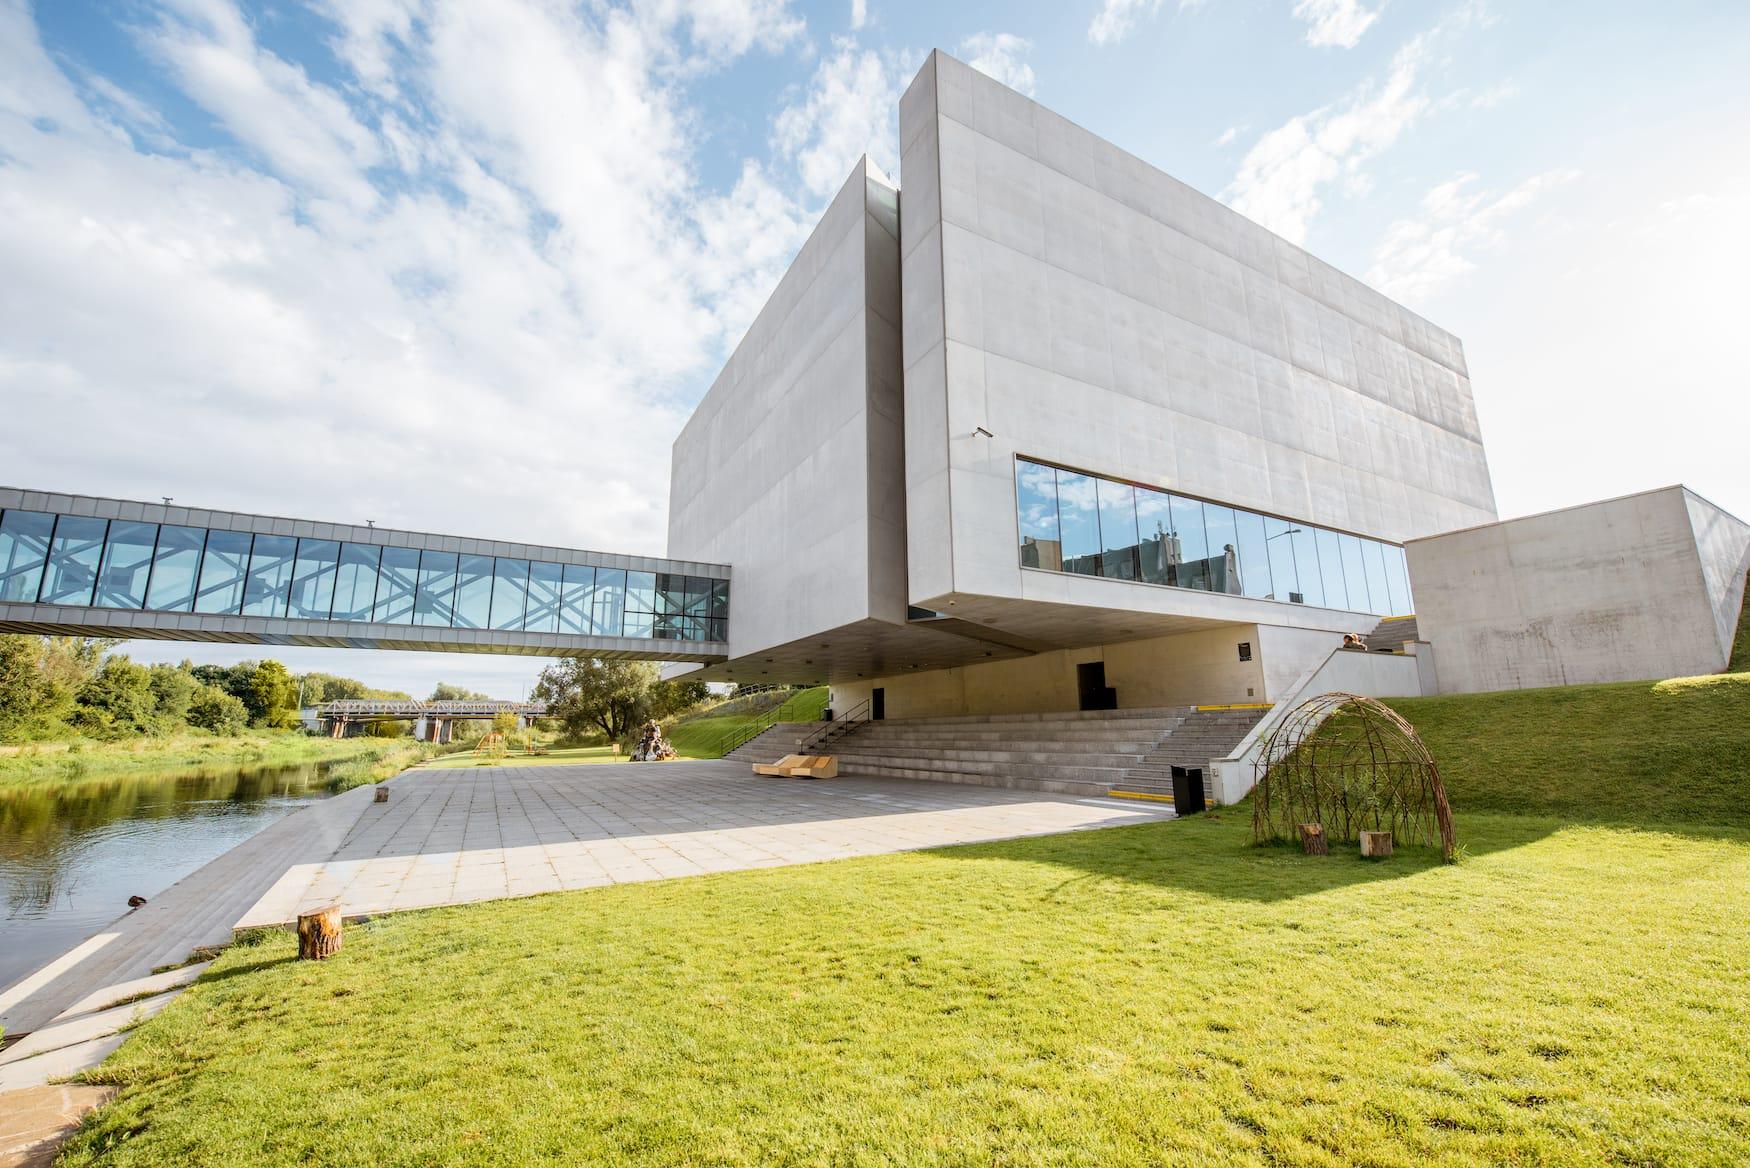 Moderne Architektur an der Porta Posnania